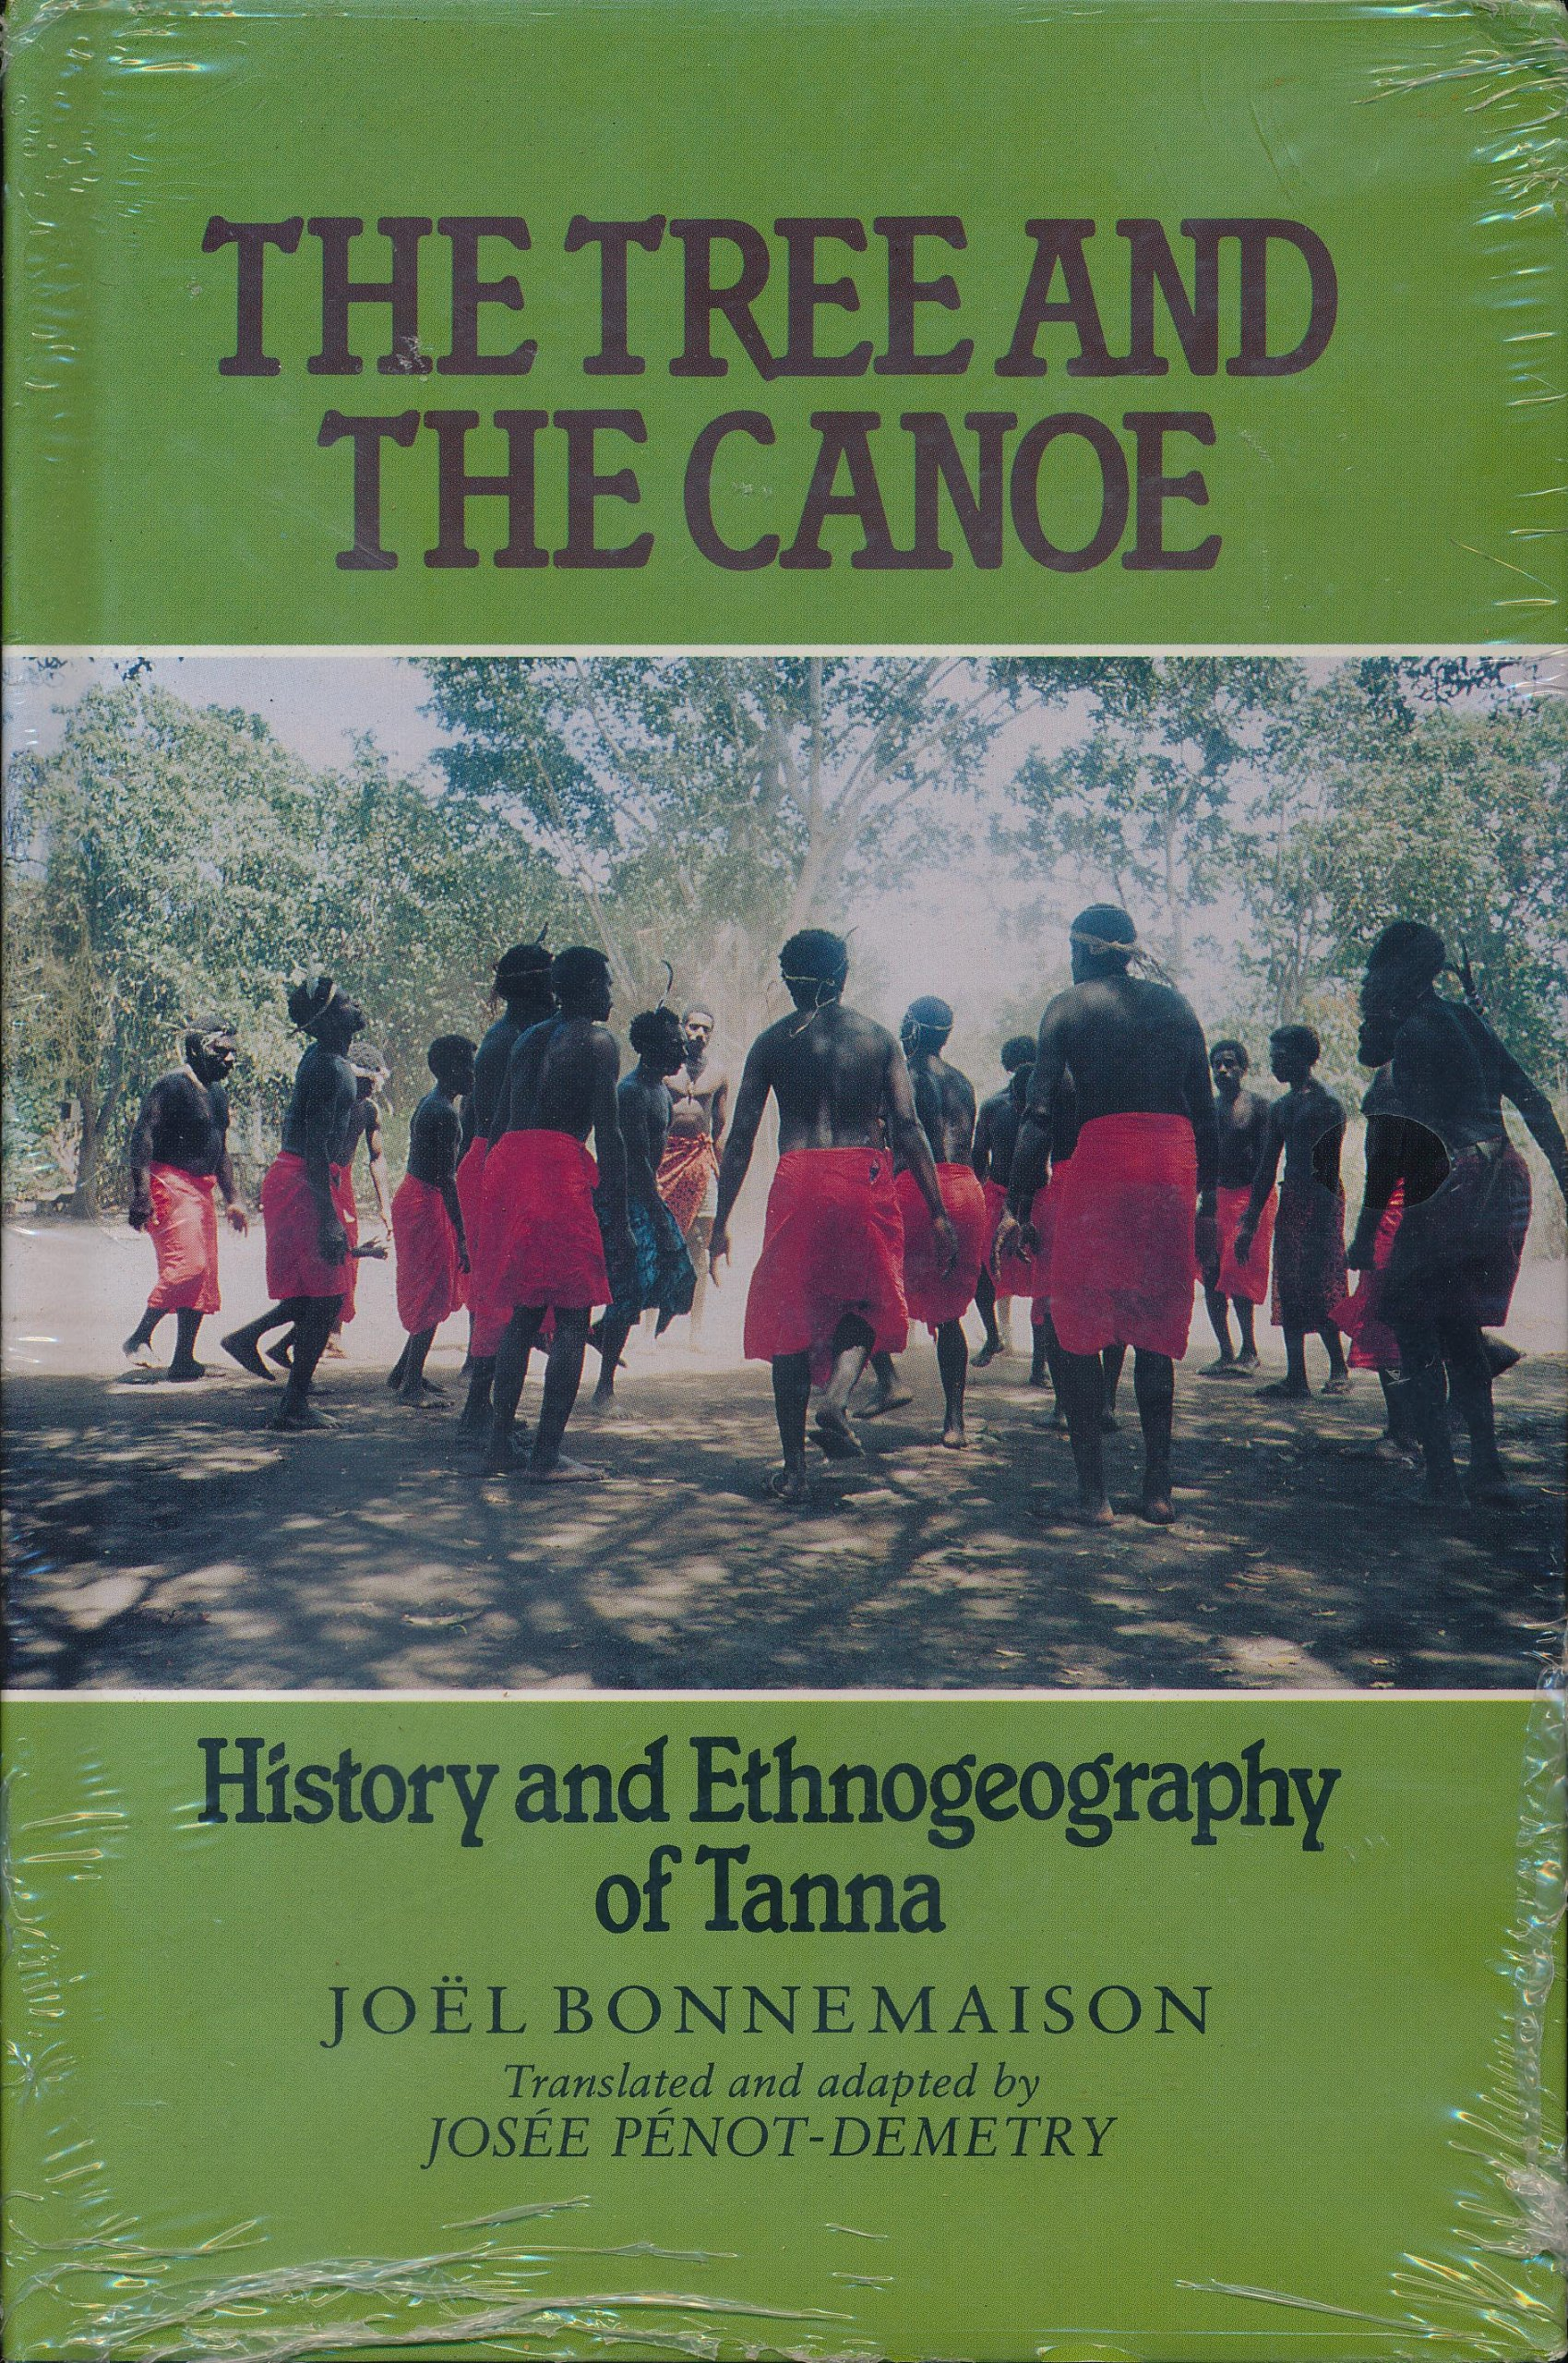 The Tree and the Canoe: History and Ethnogeography of Tanna (South Sea  Book): Penot-Demetry, Josee, Bonnemaison, Joel, Penot-Demetry, Josee:  9780824815257: Amazon.com: Books